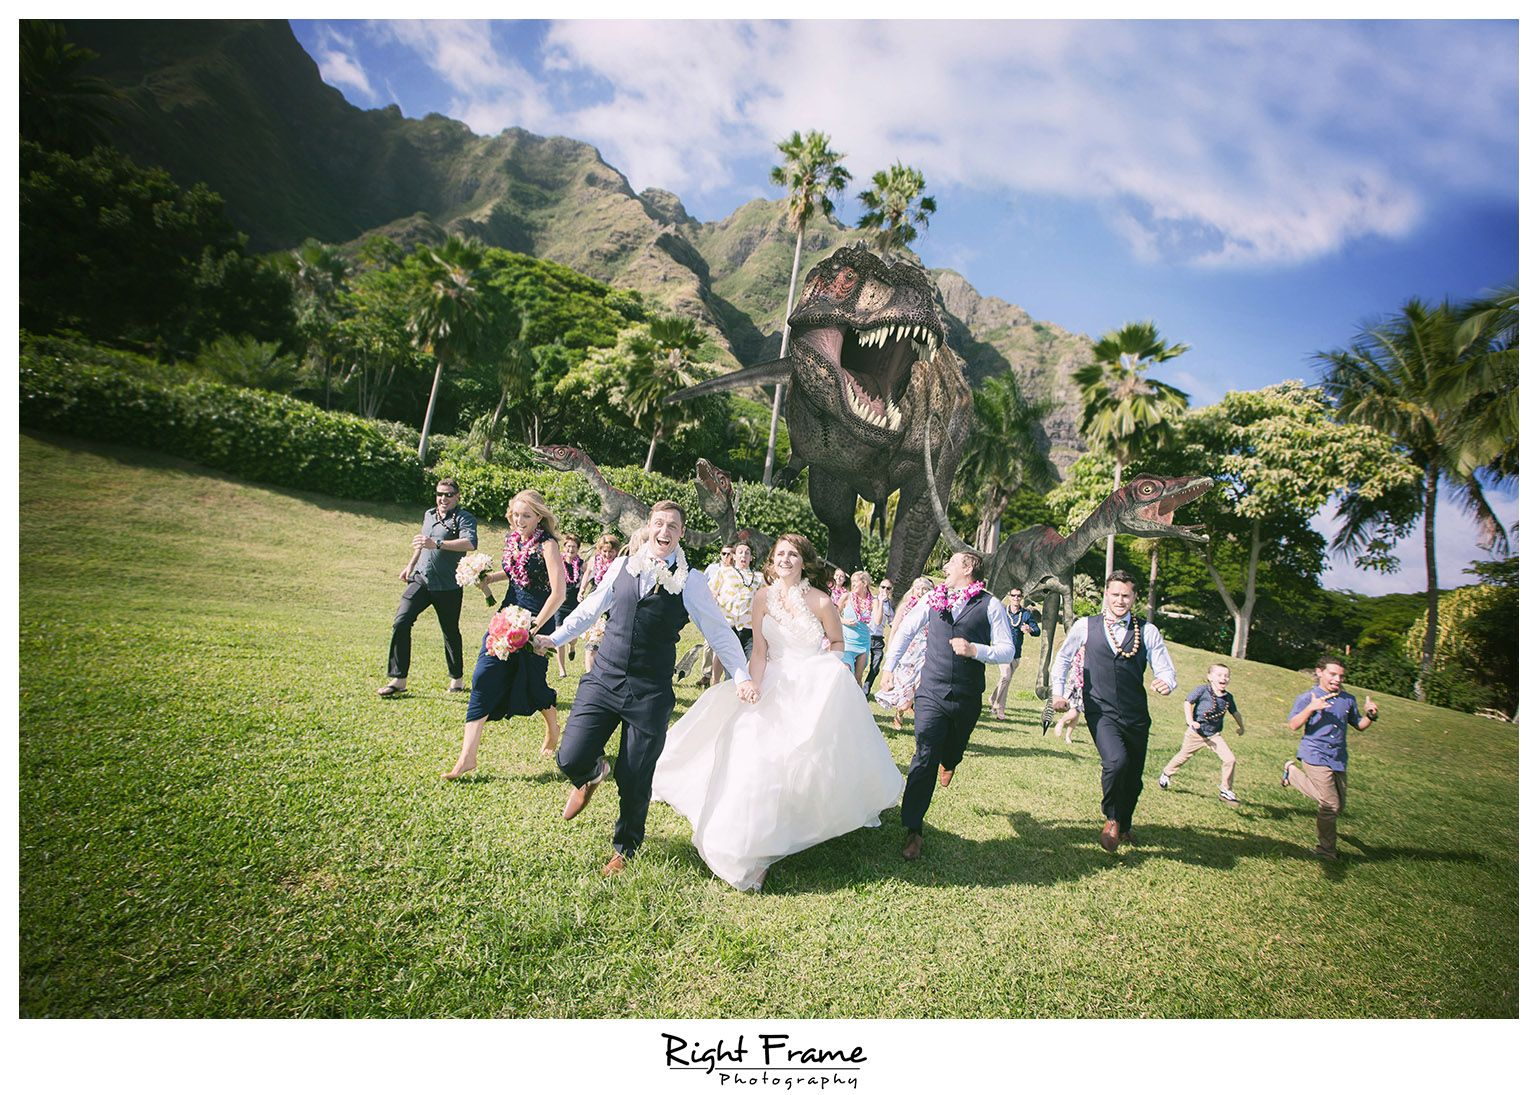 Rightframe kualoa ranch wedding paliku gardens hawaii rightframe jurassic park dinosaurs at kualoa ranch wedding paliku gardens hawaii destination wedding oahu weddings photography ideas junglespirit Choice Image